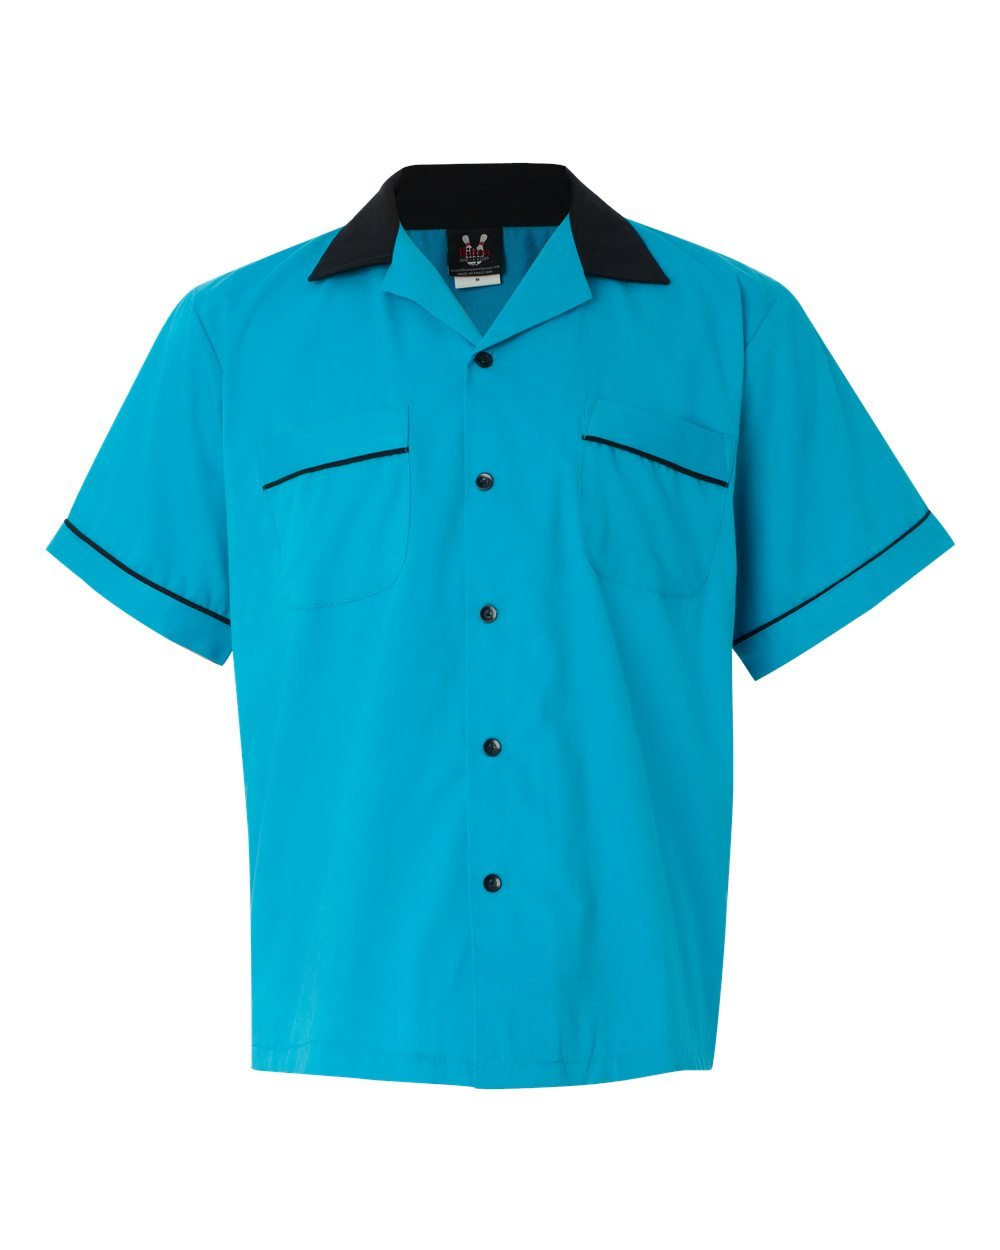 Hilton Bowling Retro Gm Legend, Turquoise/Black, Small